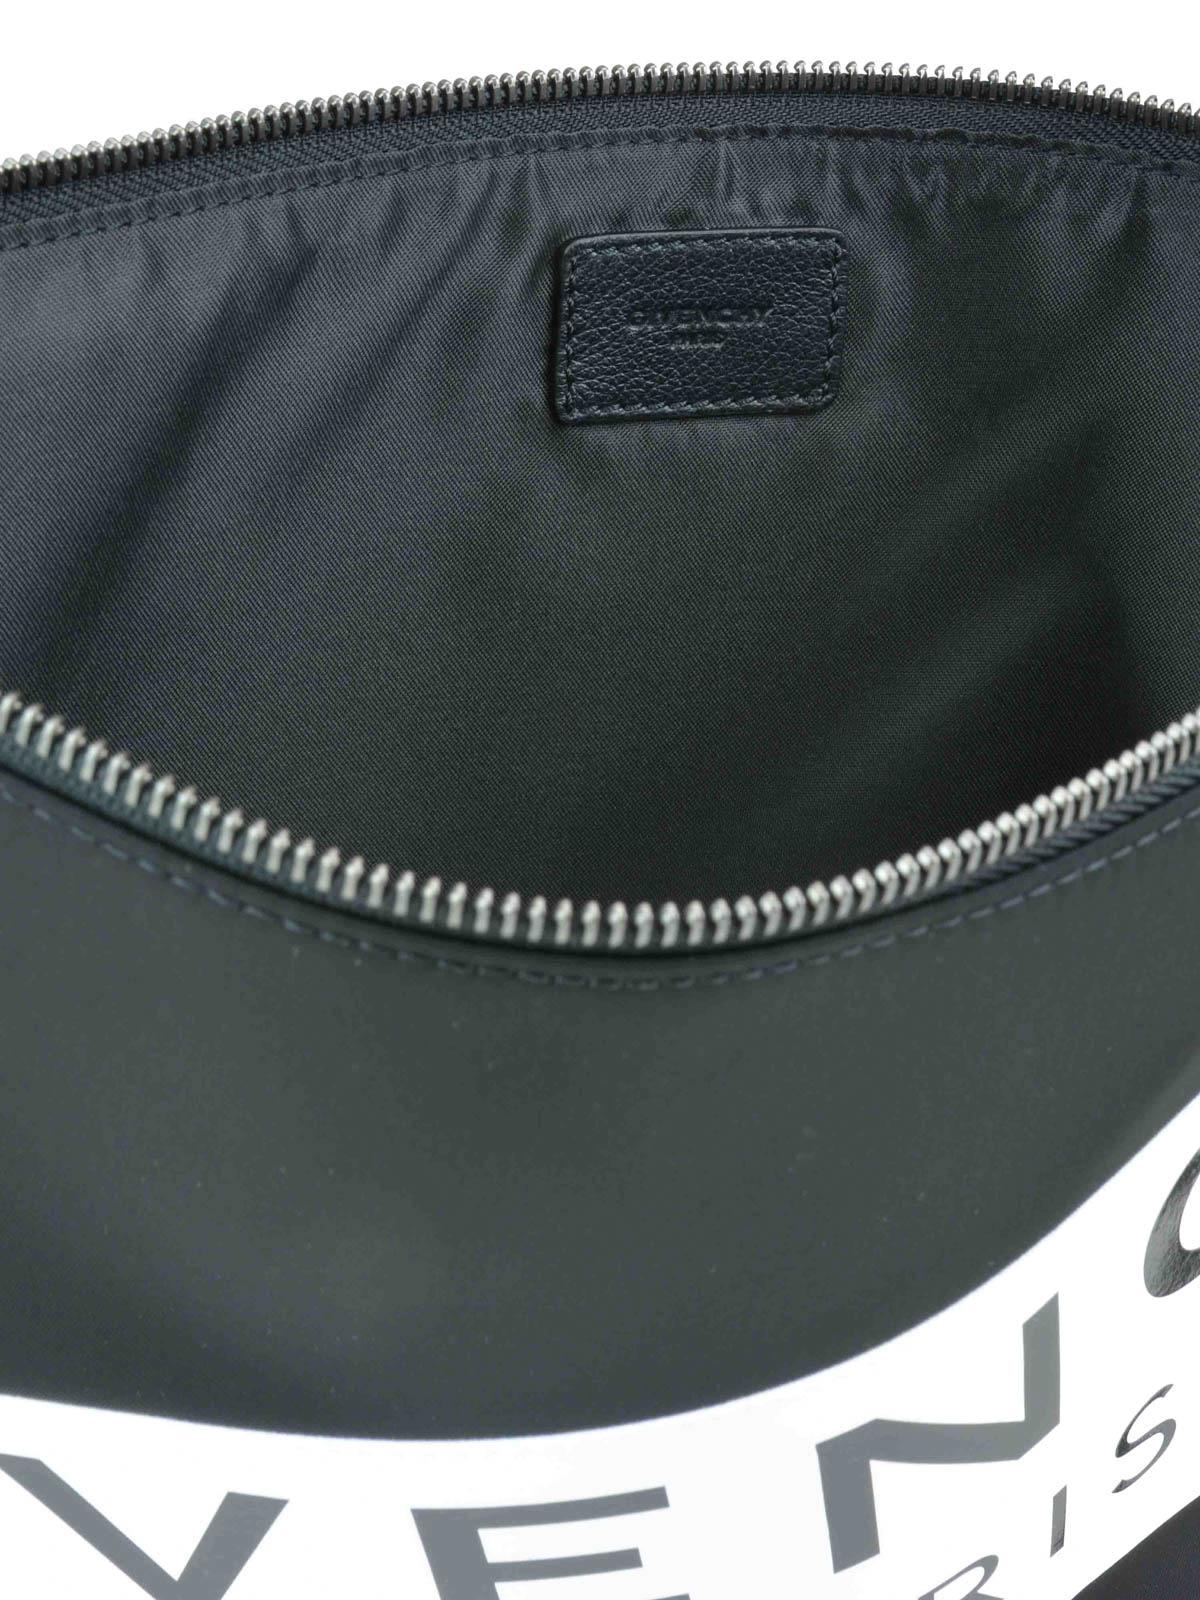 10f176fd0e5f9 Givenchy - Clutch - Schwarz - Clutches - BK602XK0FG 004